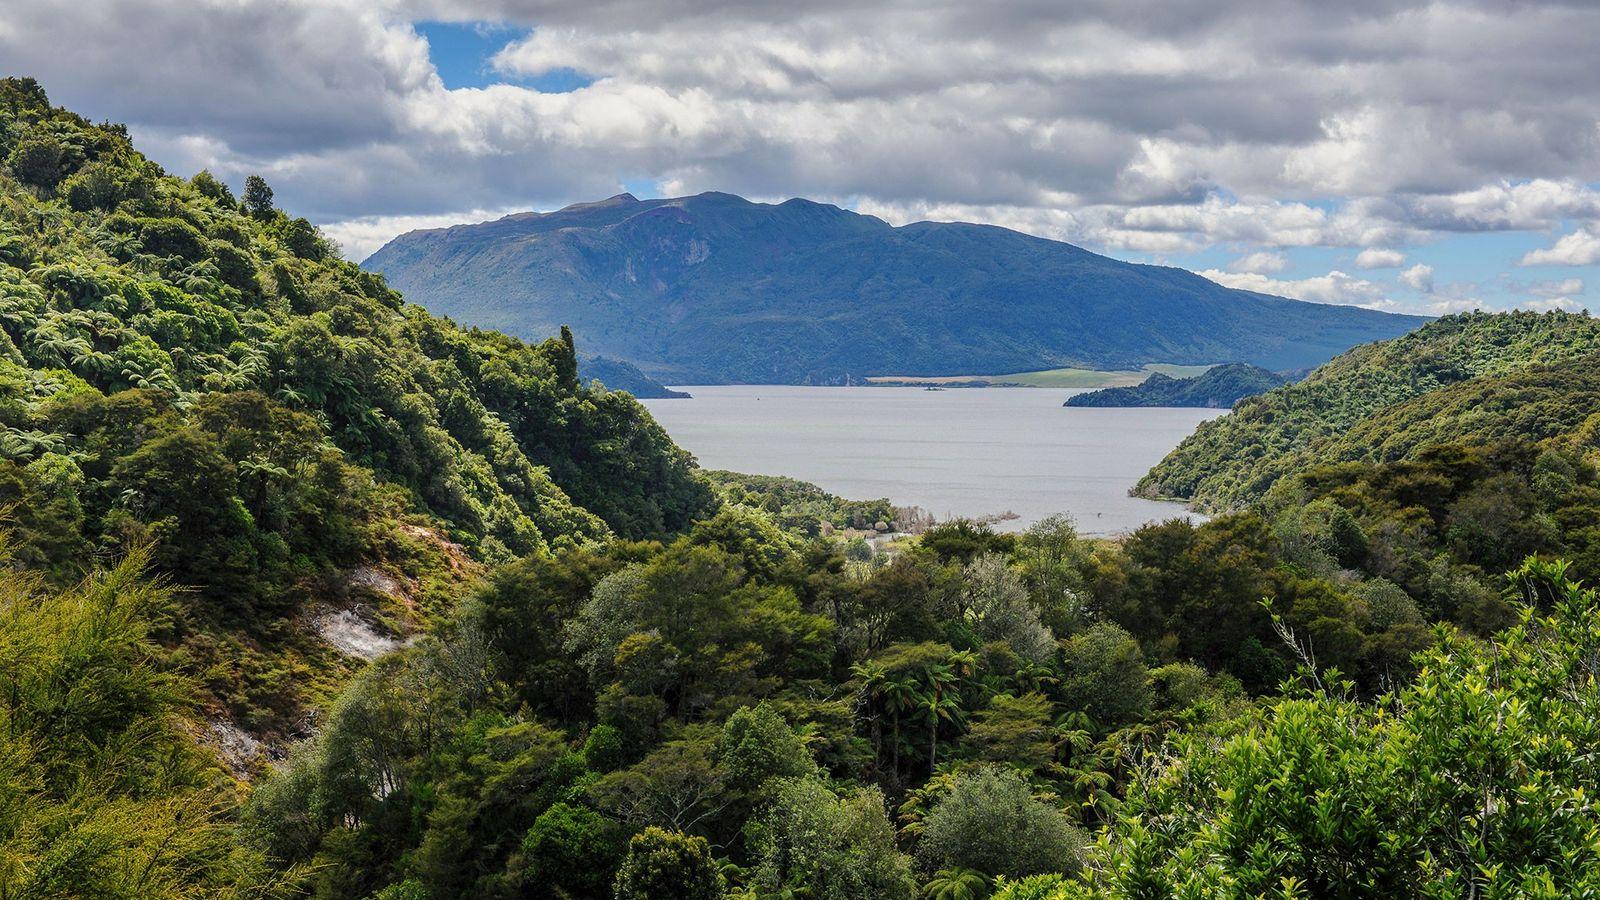 Blick auf den Lake Rotomahana, Waimangu Volcanic Valley, Nordinsel, Neuseeland